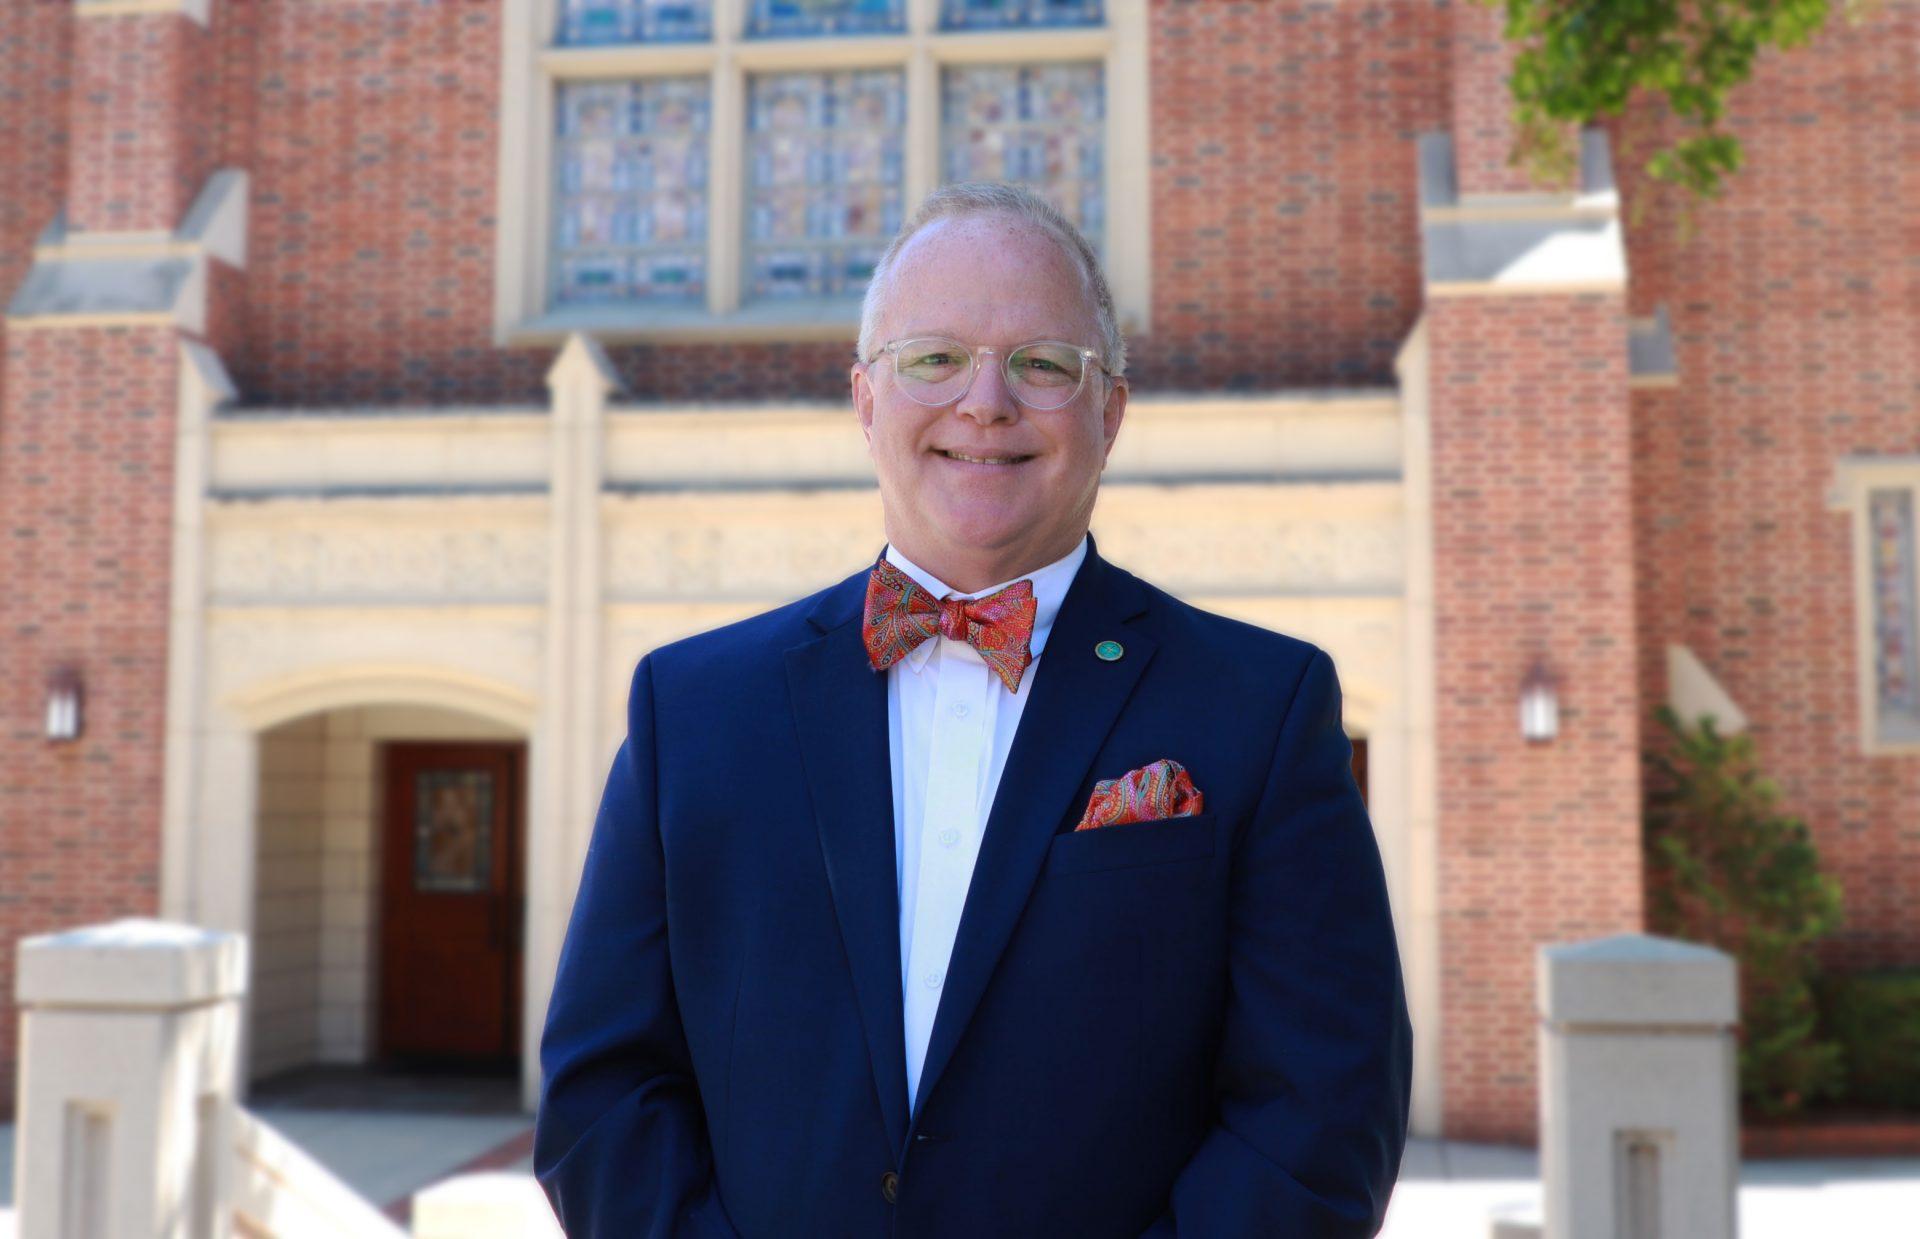 Rev. Scott Hearn